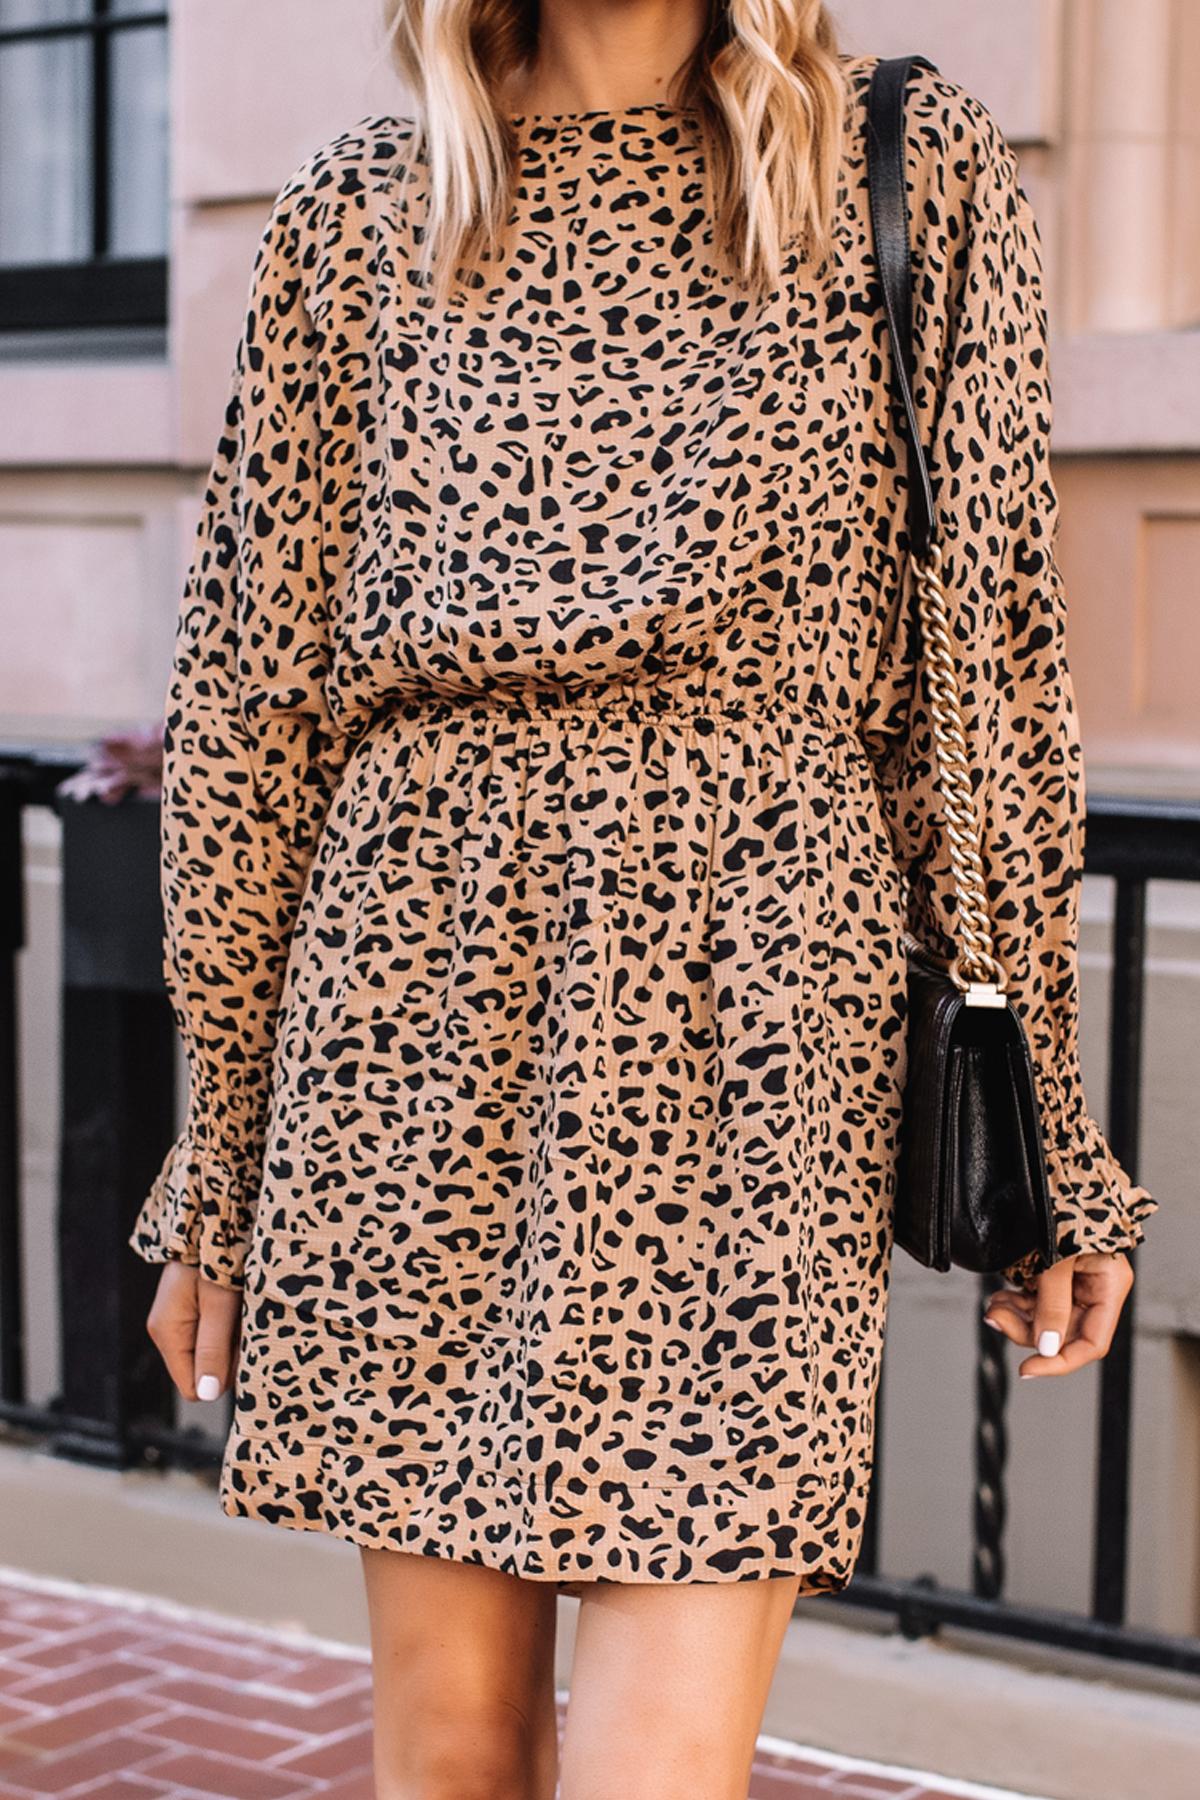 Fashion Jackson Wearing Baum und Pferdgarten Aemiley Drape Leopard Mini Dress 2